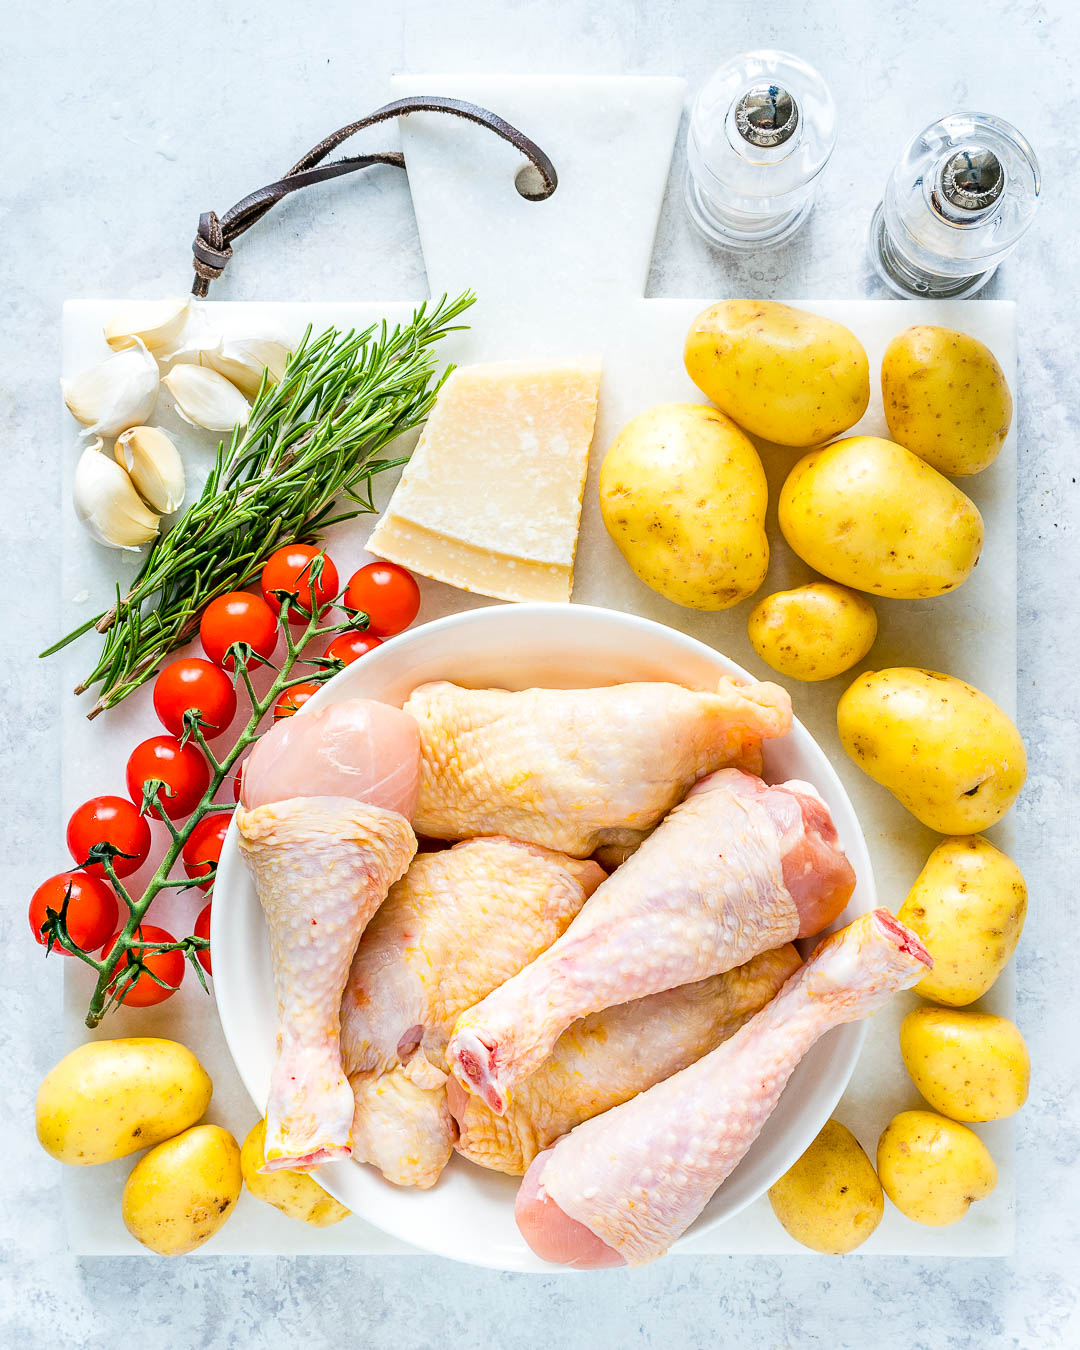 Slow Cooker Garlic Parmesan Chicken Ingredients